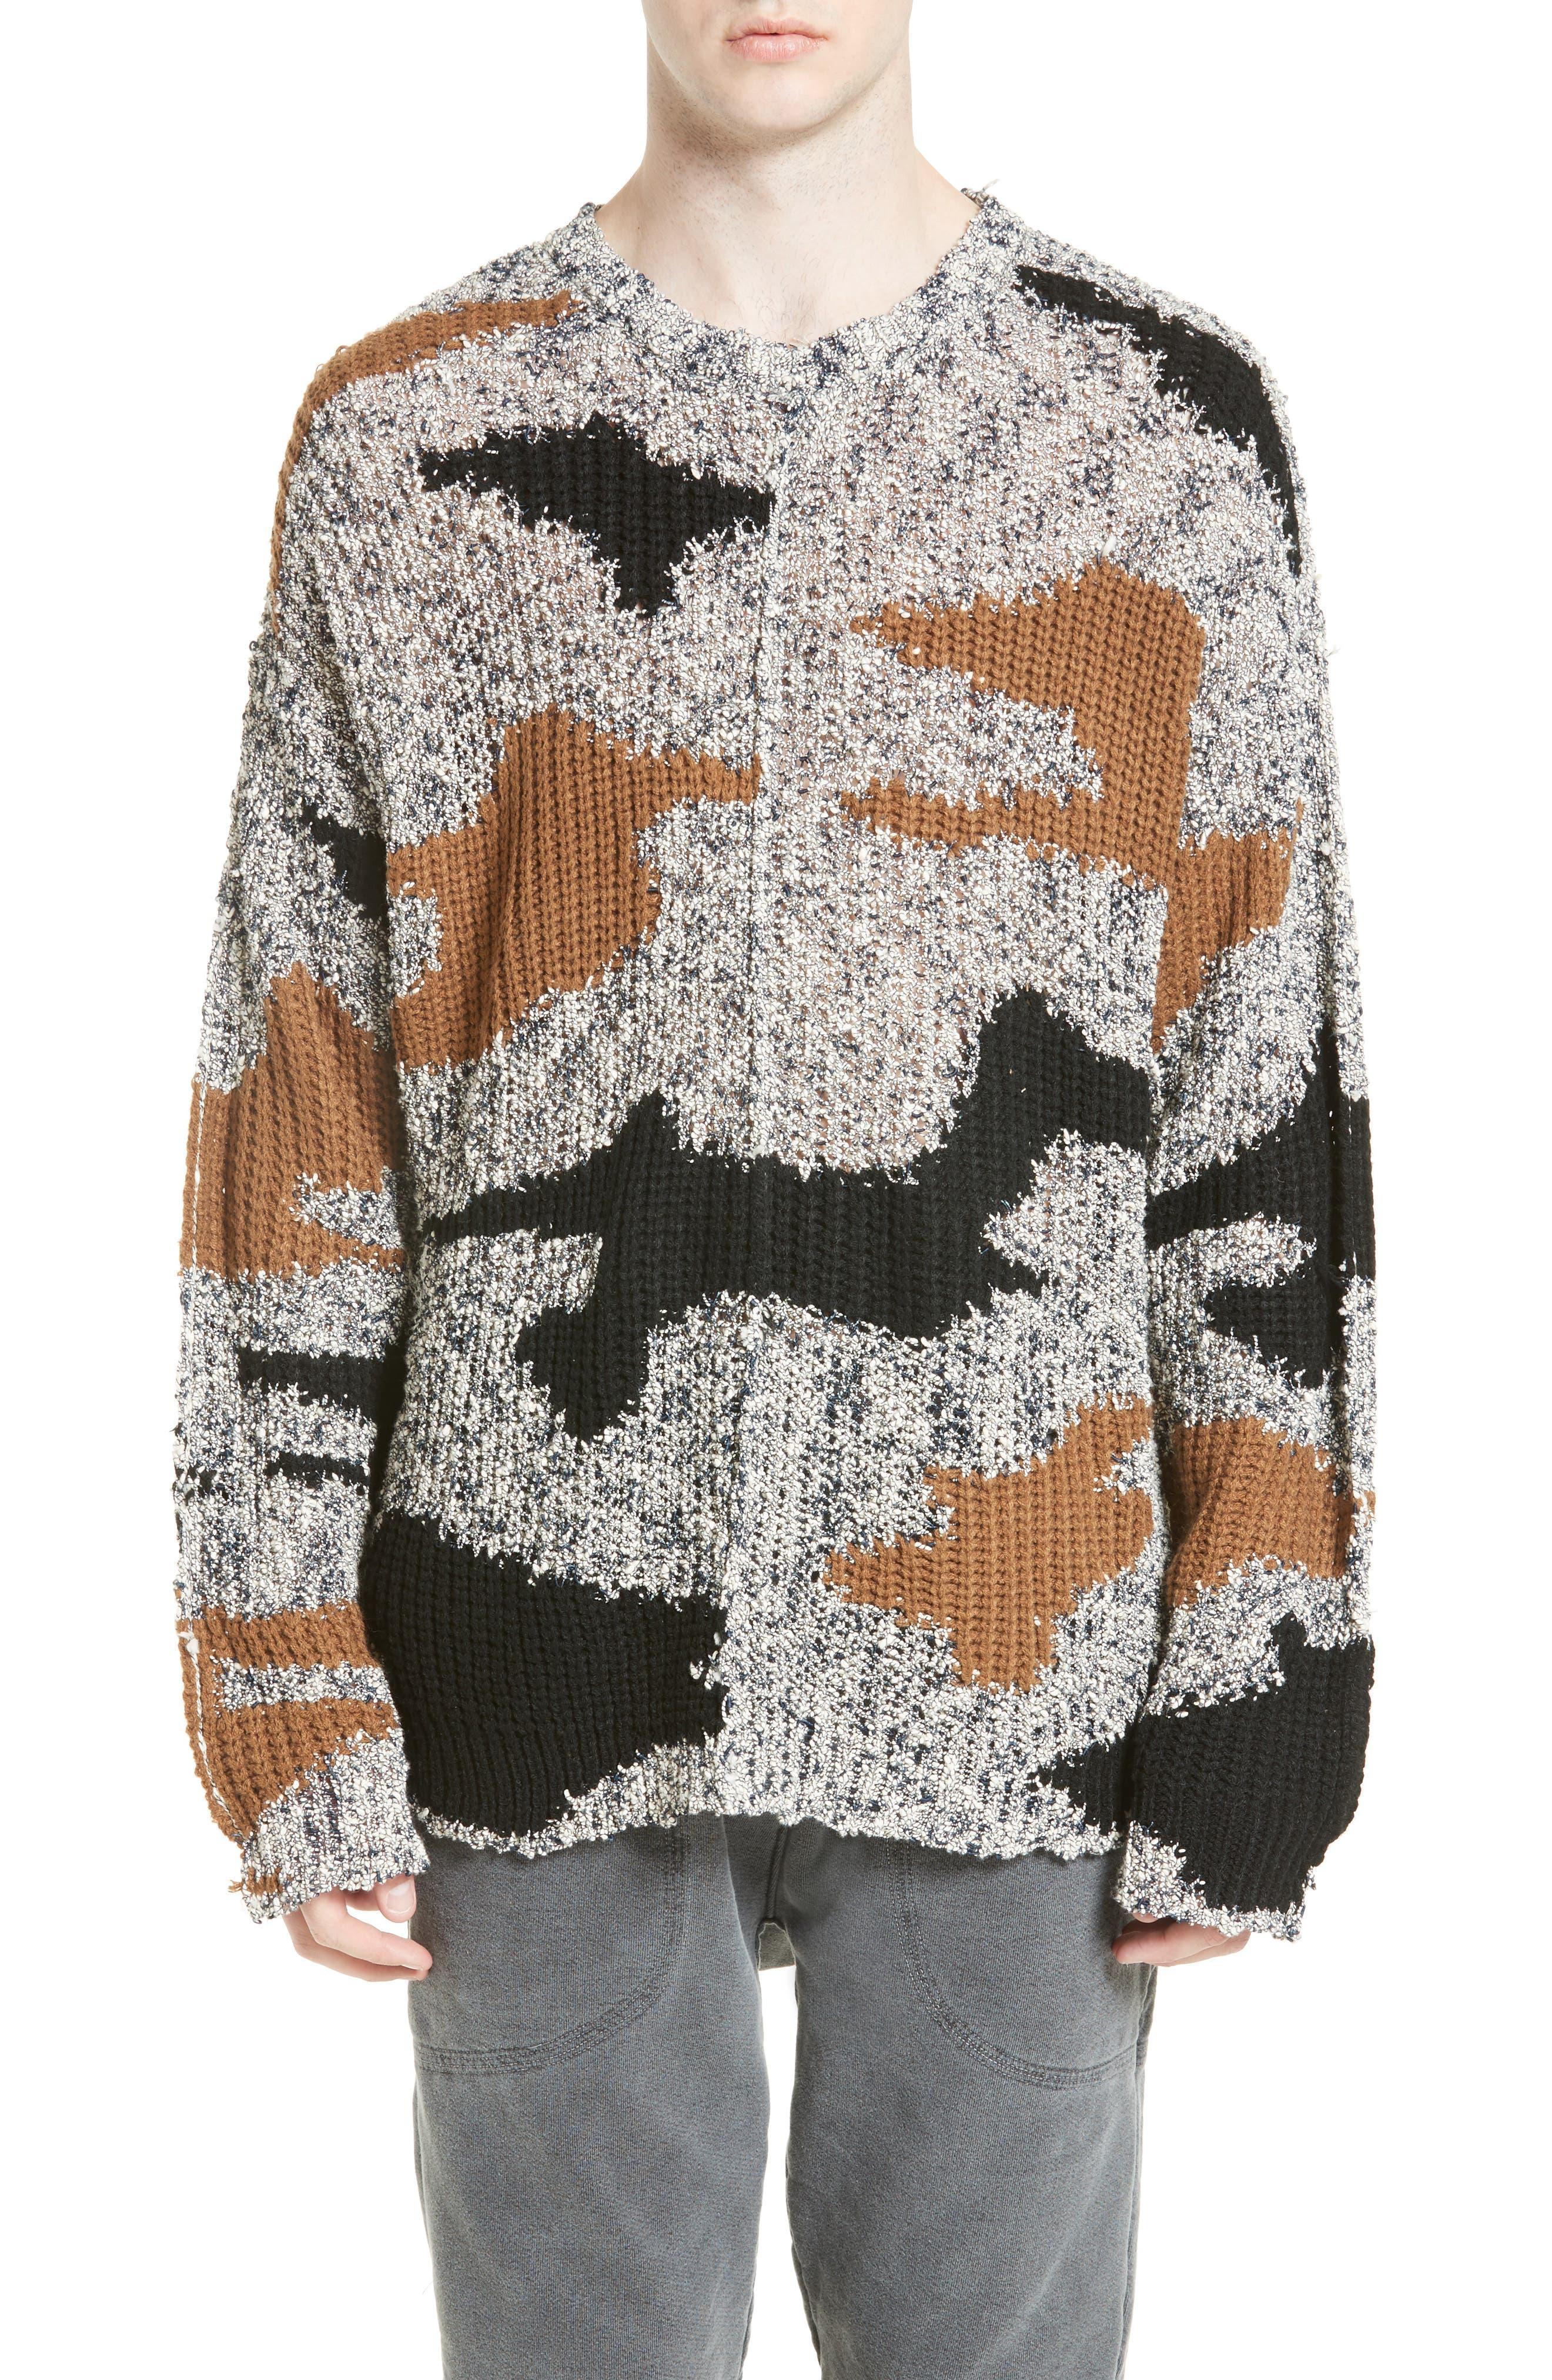 Drifter Contenential Mixed Sweater